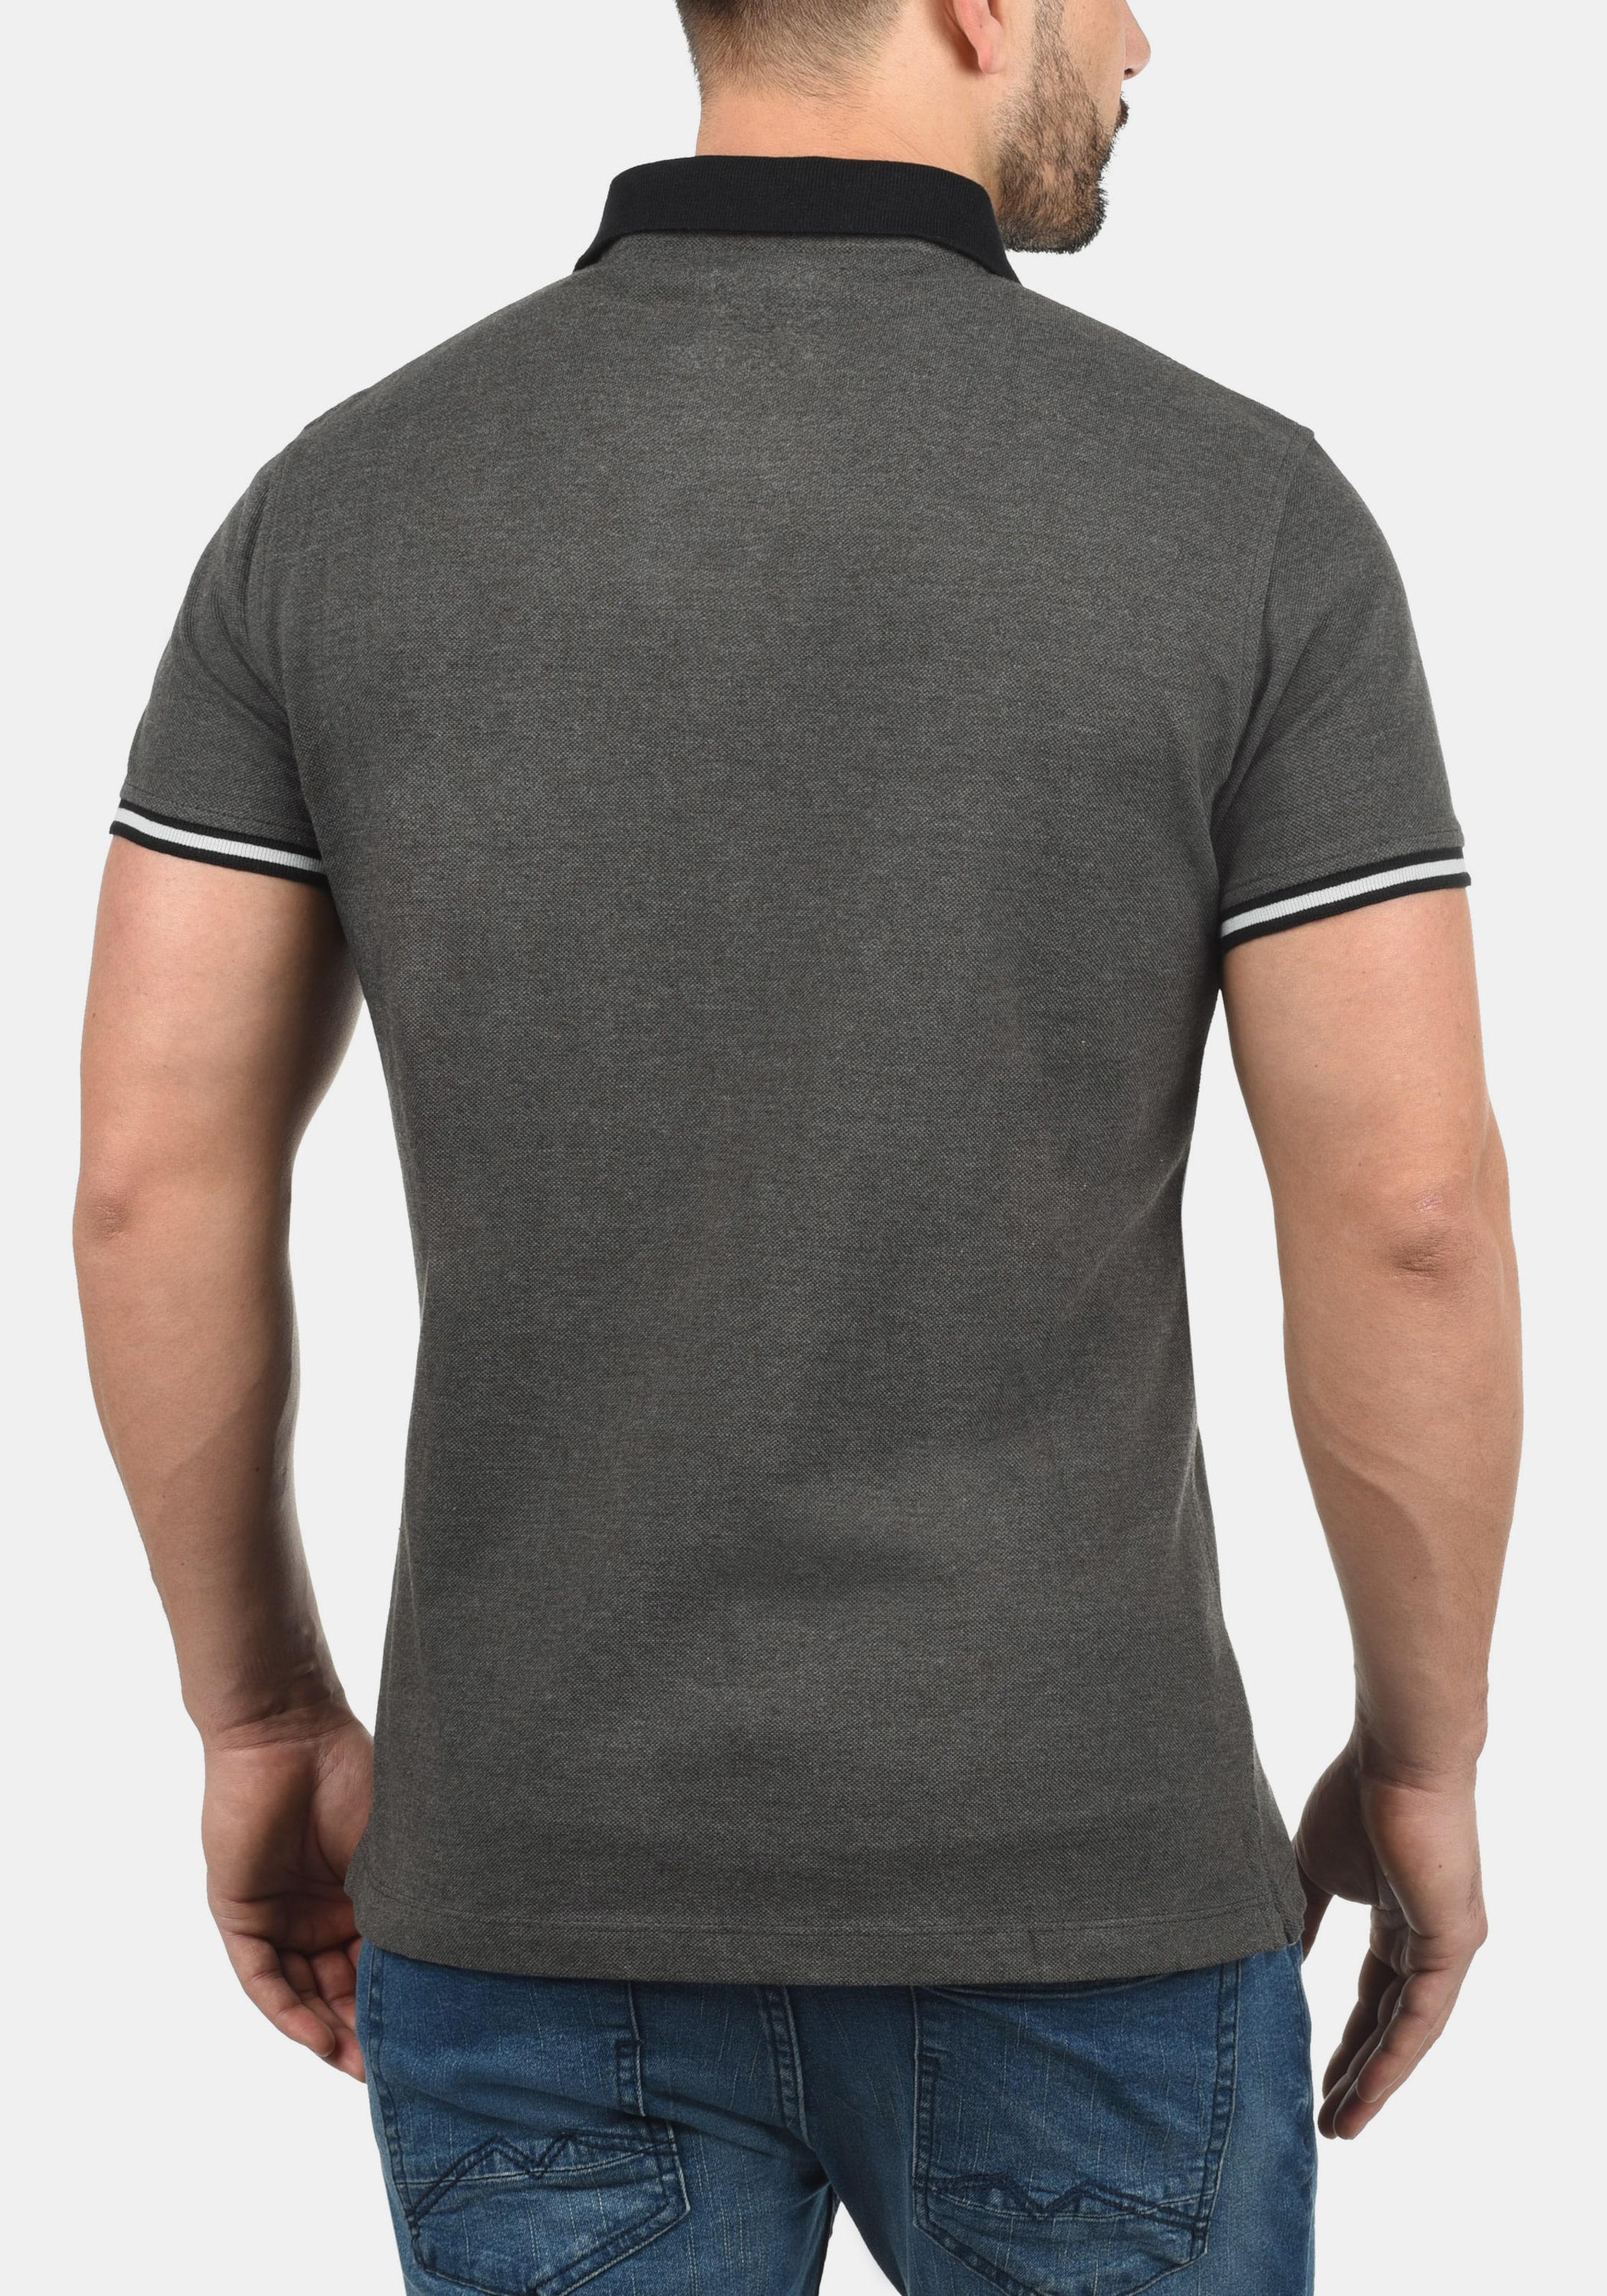 GrauDunkelgrau Blend Blend Poloshirt 'prato' In ChQxrdts